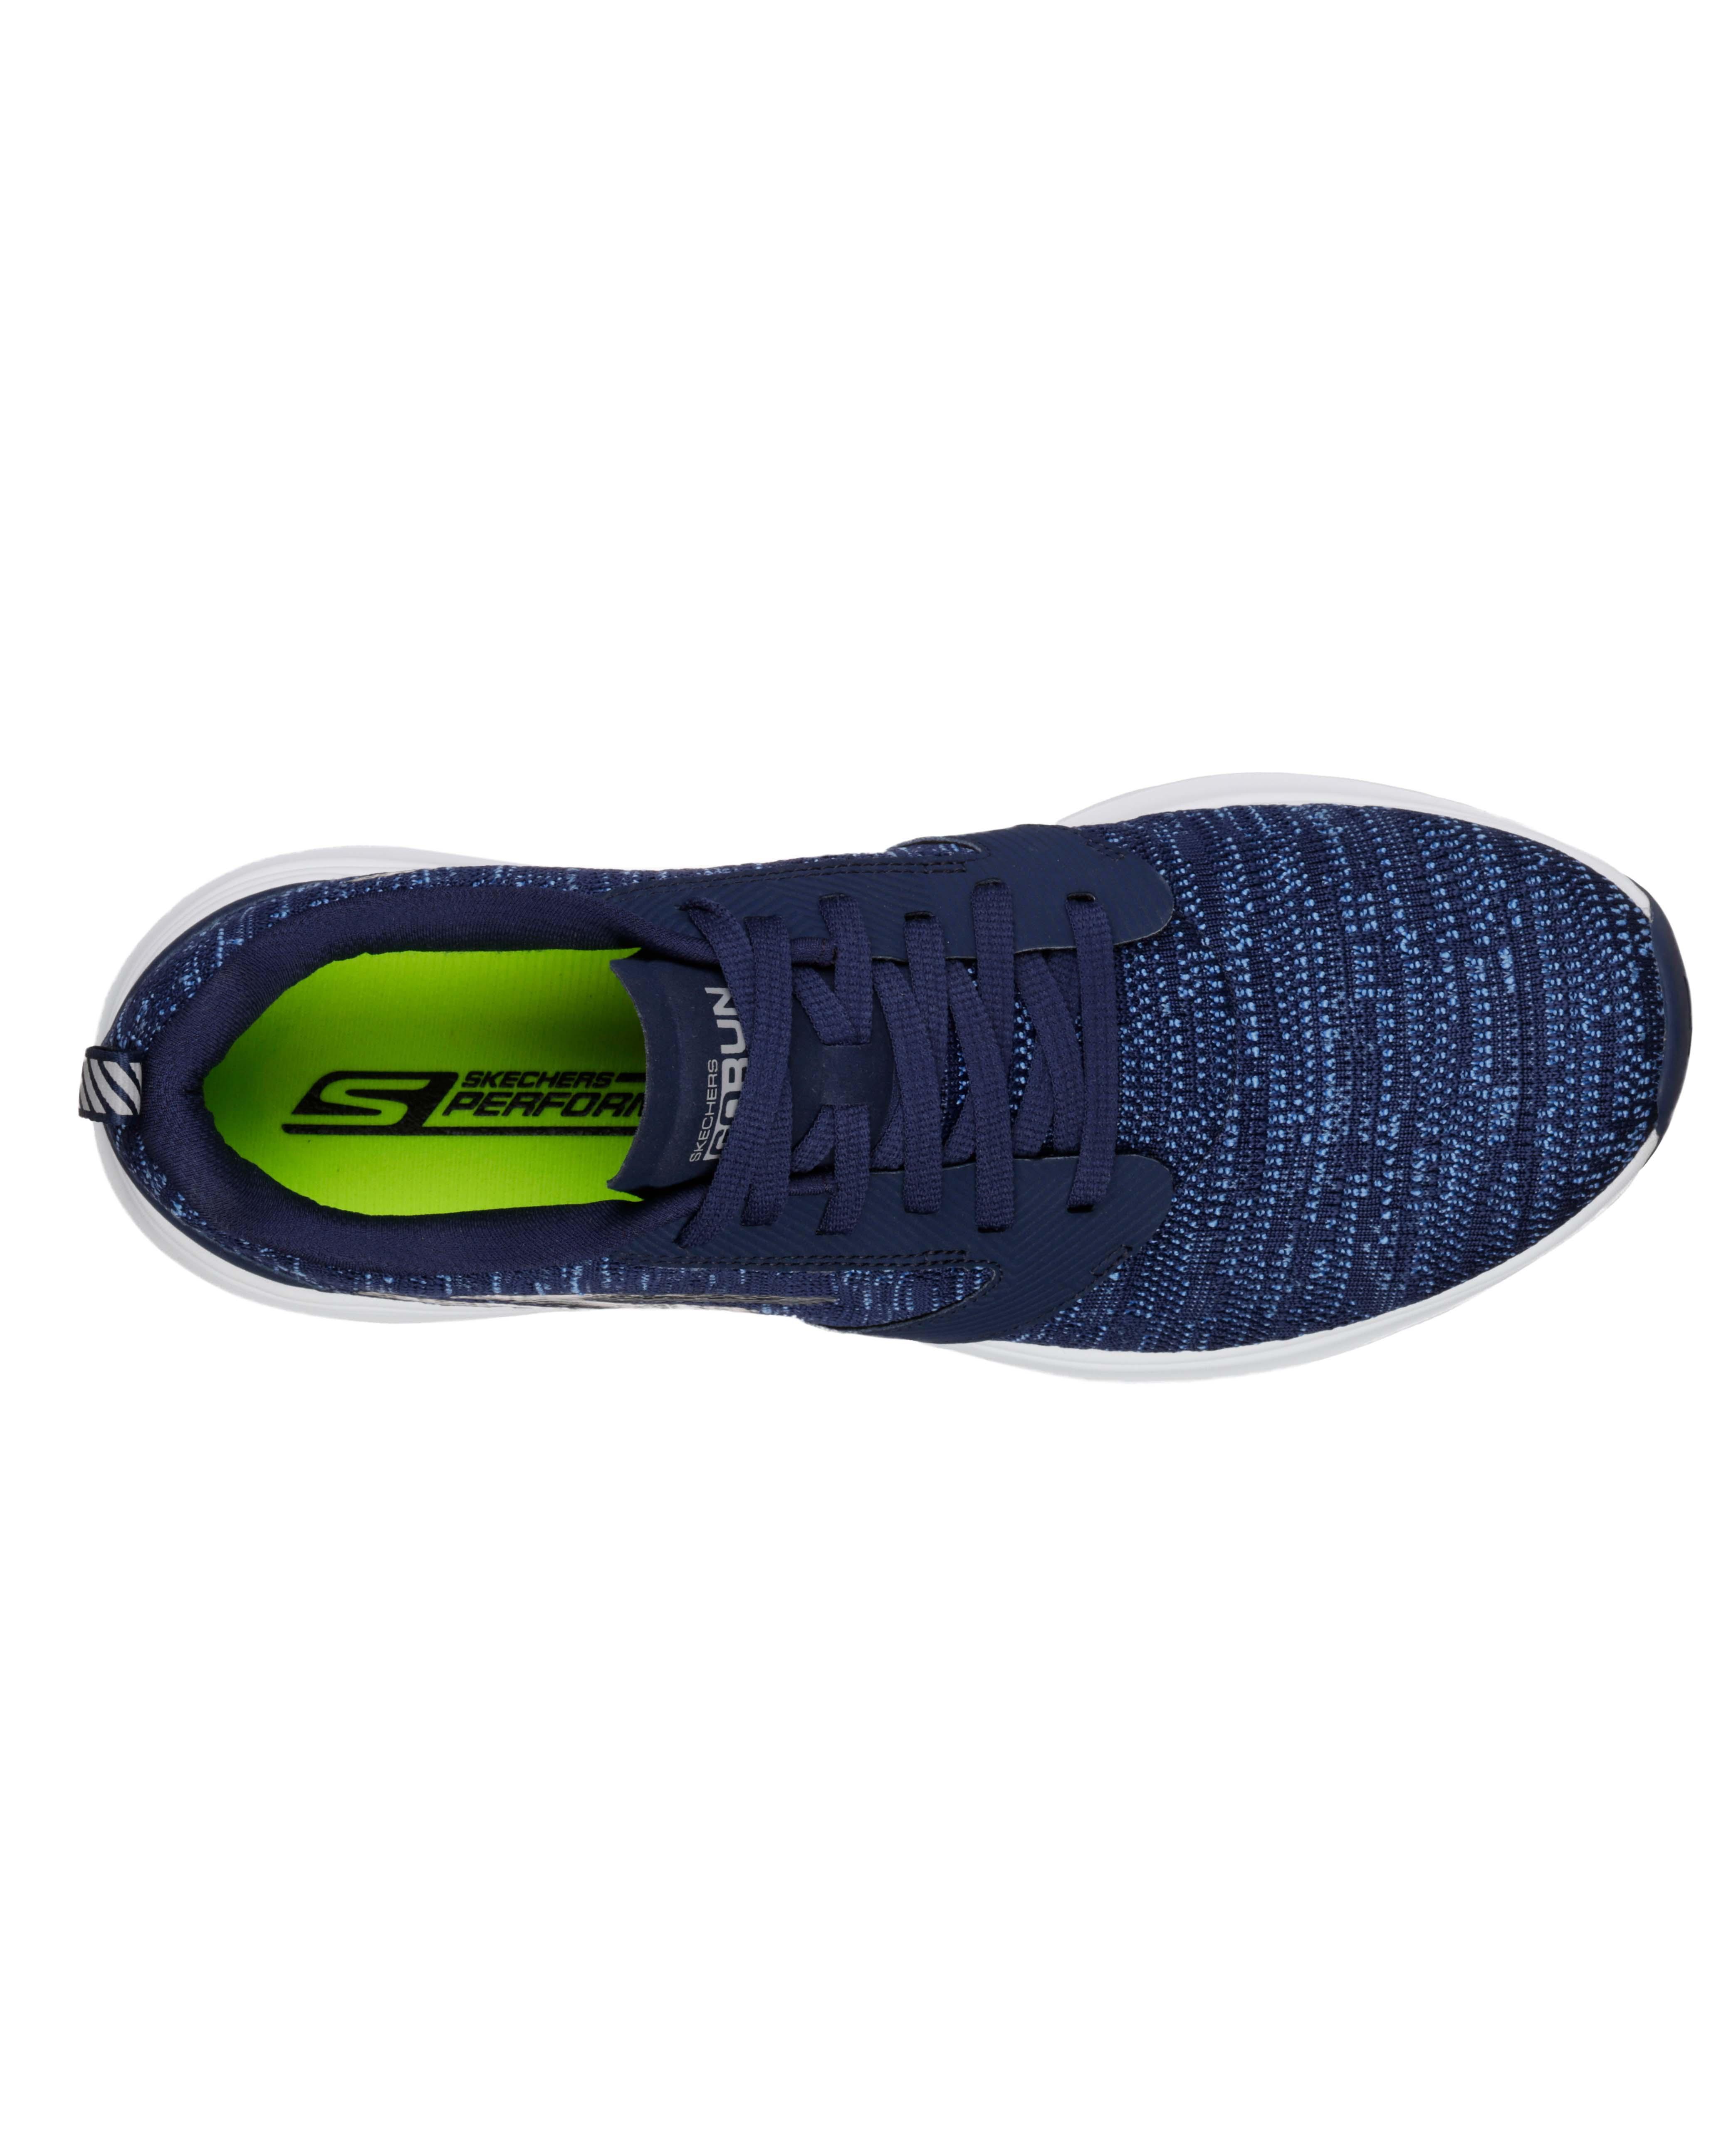 skechers go walk 2 mens shoes